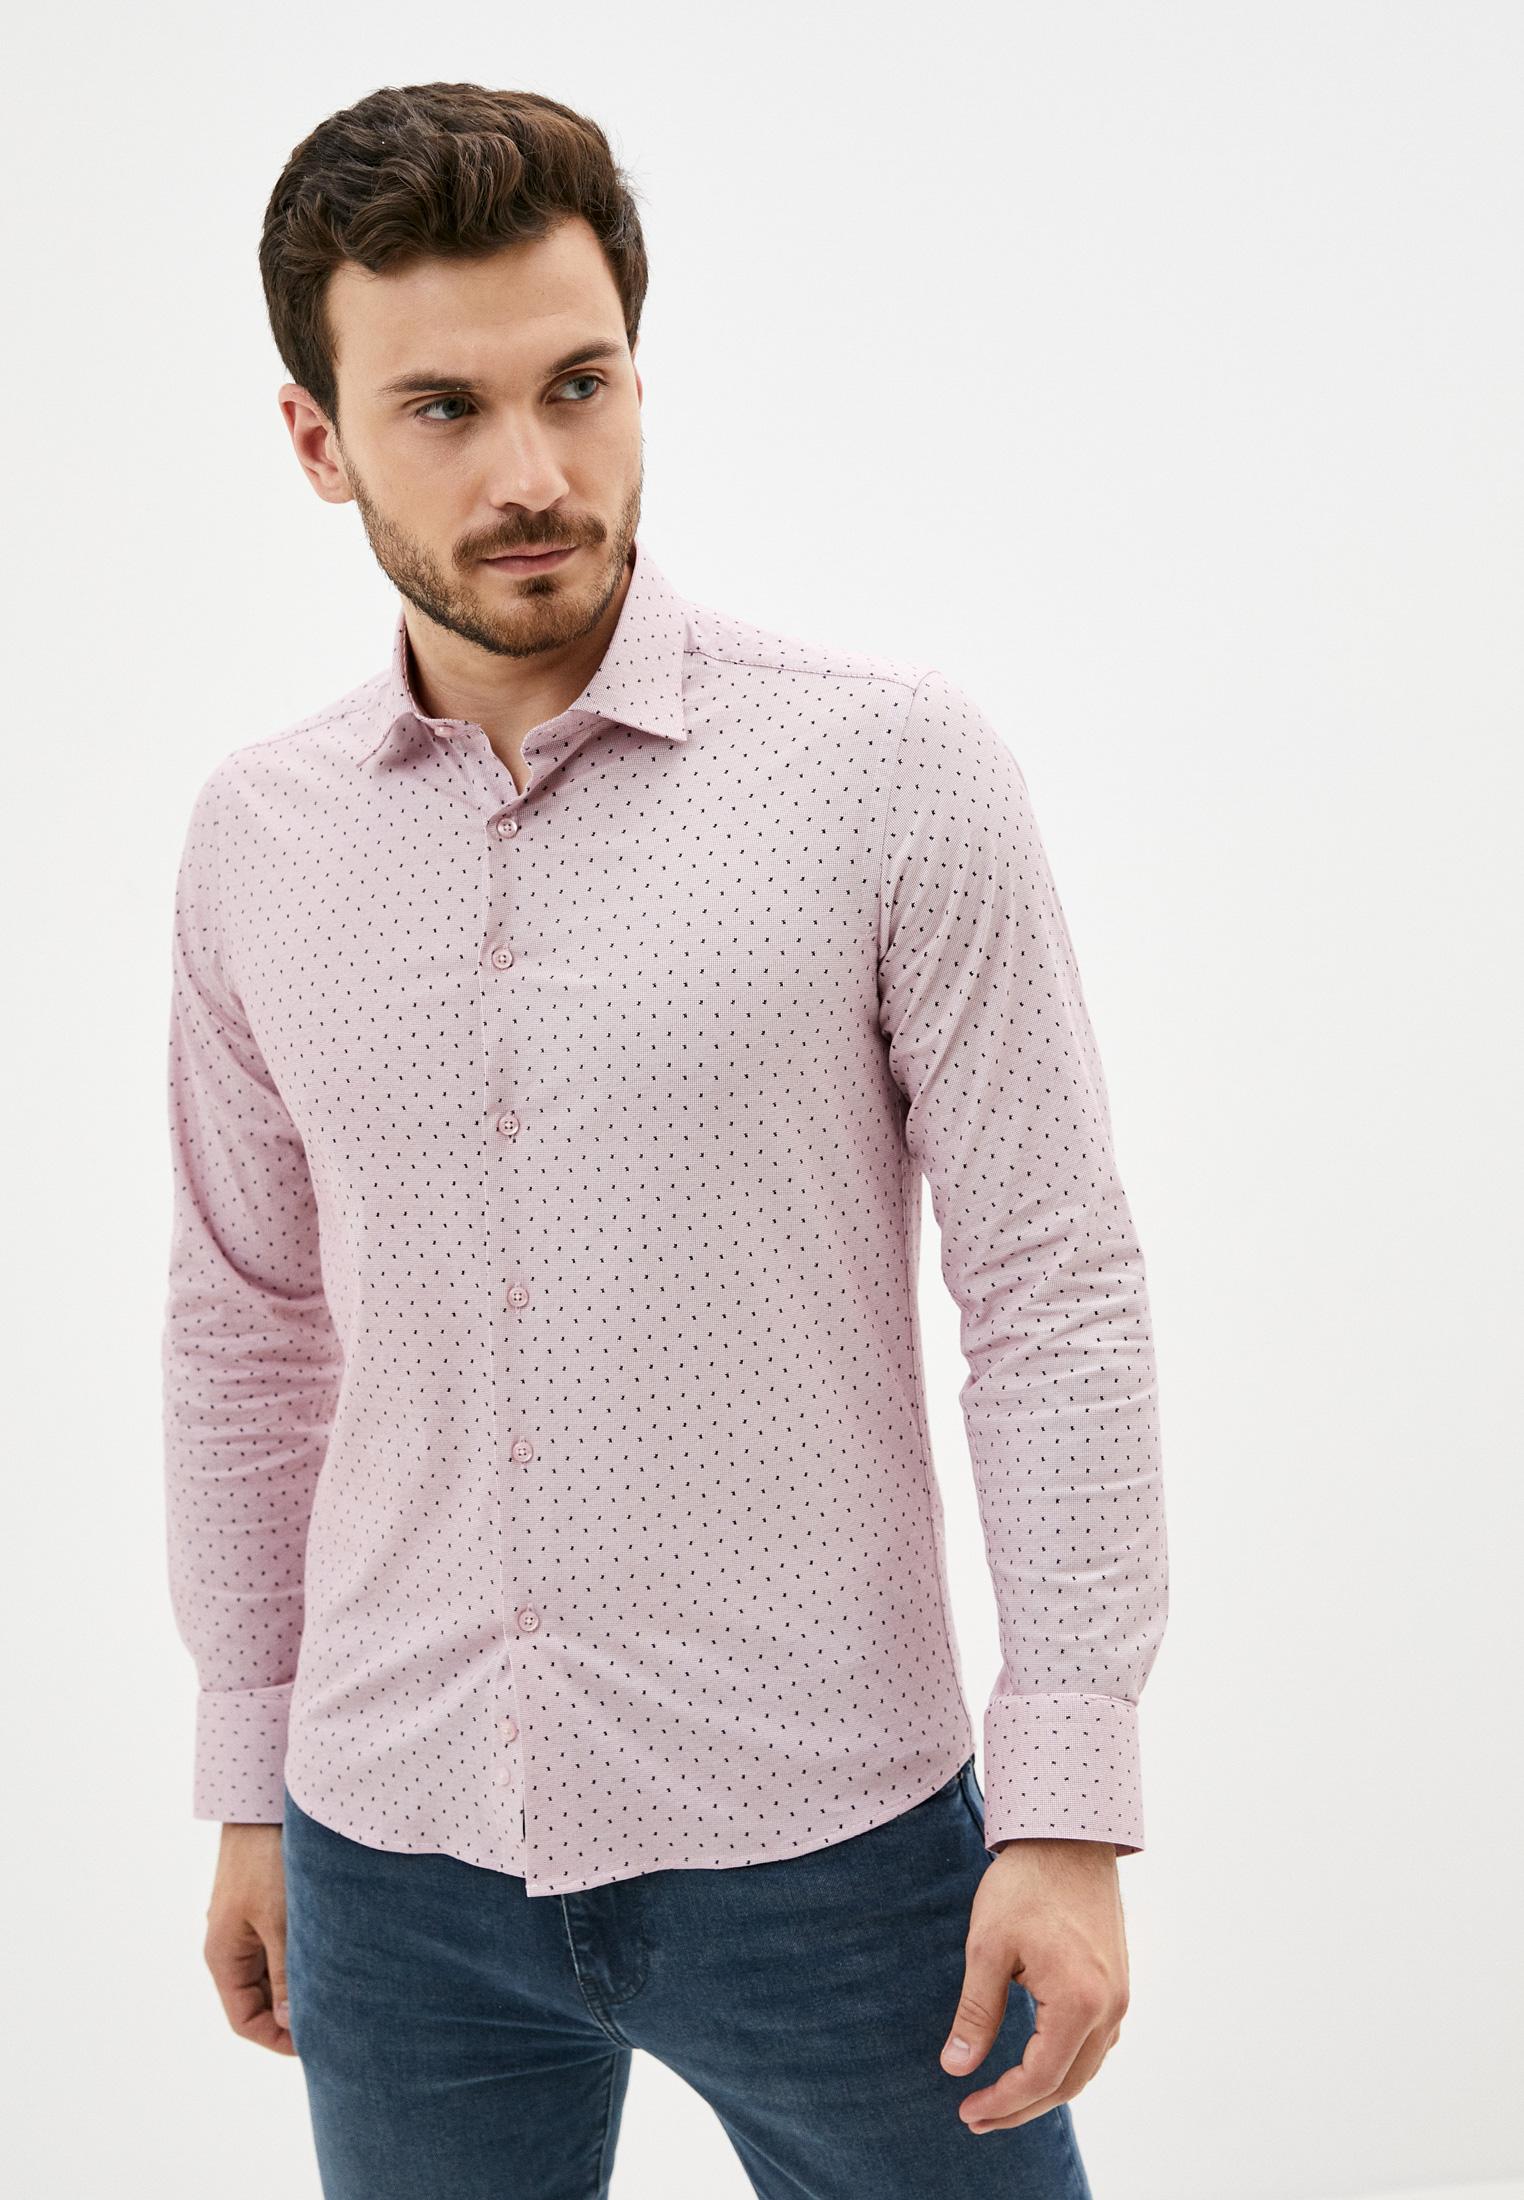 Рубашка с длинным рукавом GIORGIO DI MARE GI350524